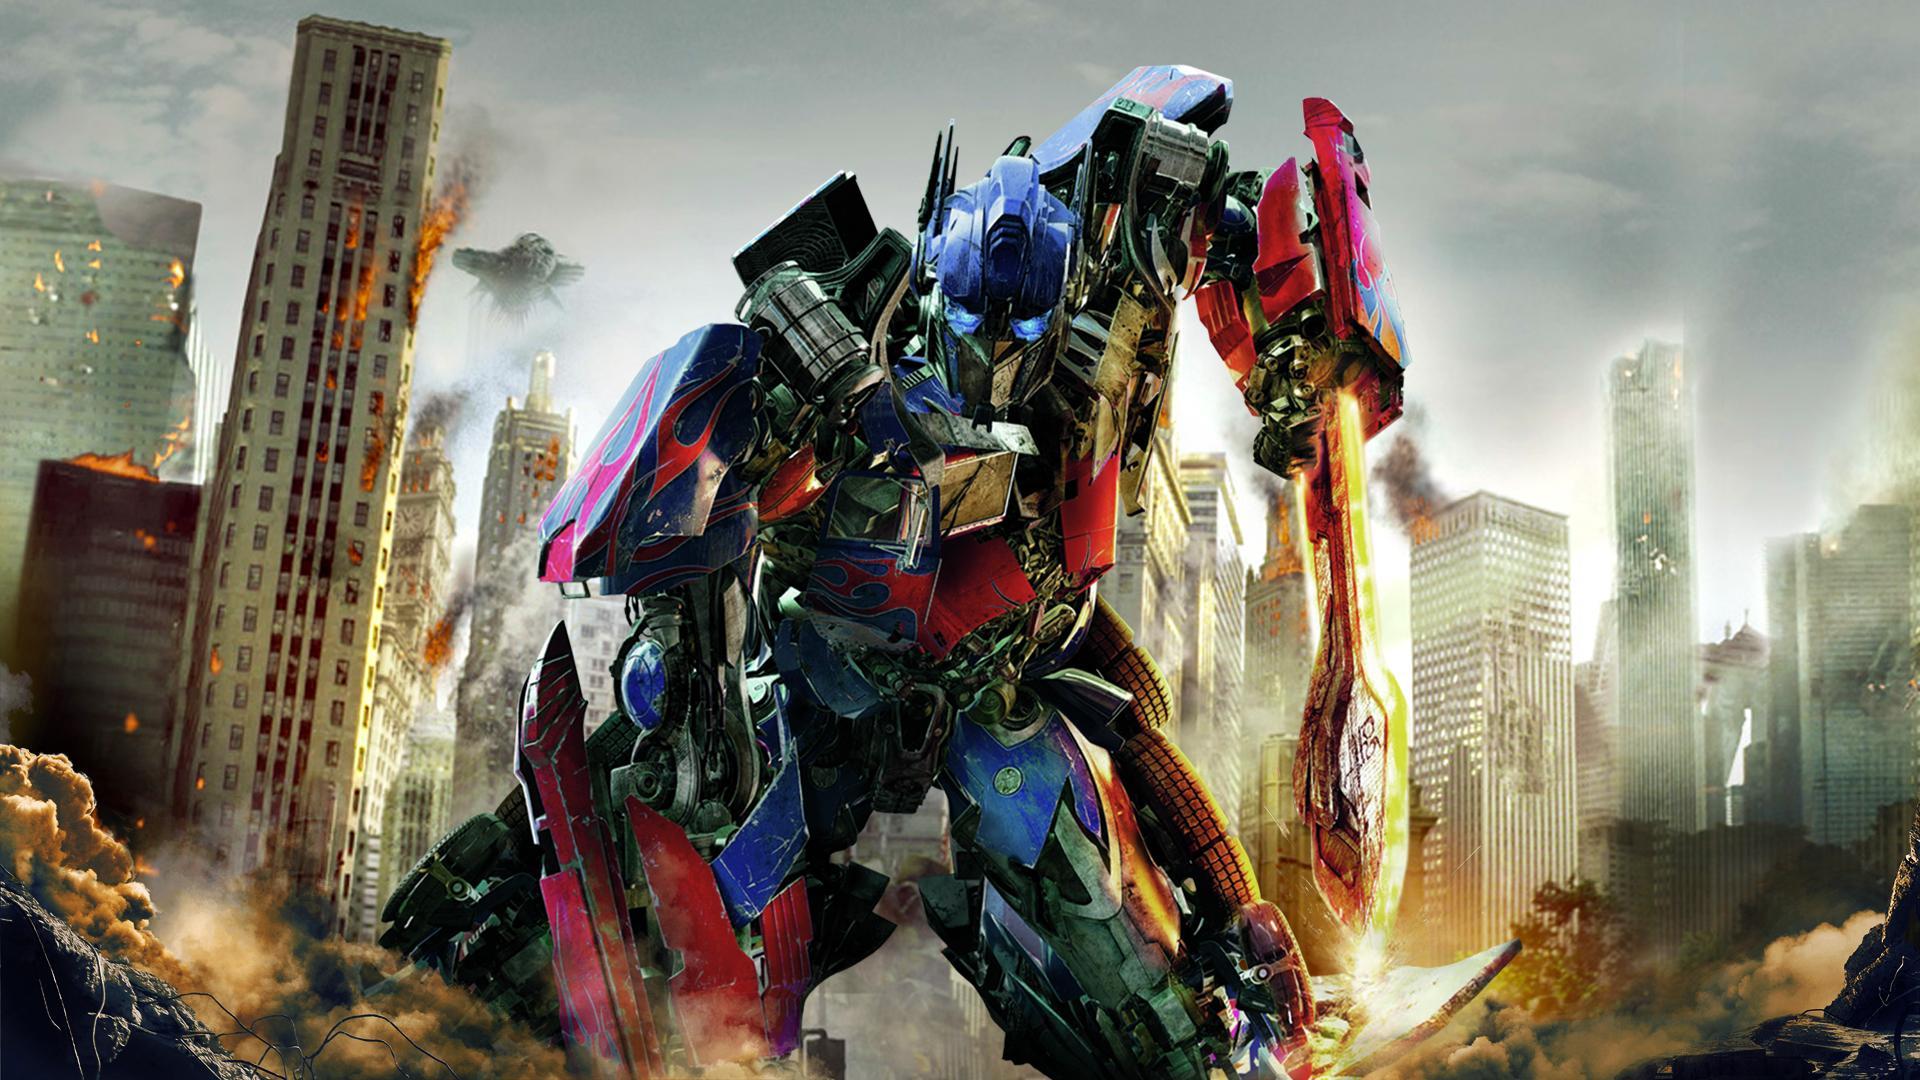 Transformers Wallpaper Transformer 3 Optimus Prime 73661 Hd